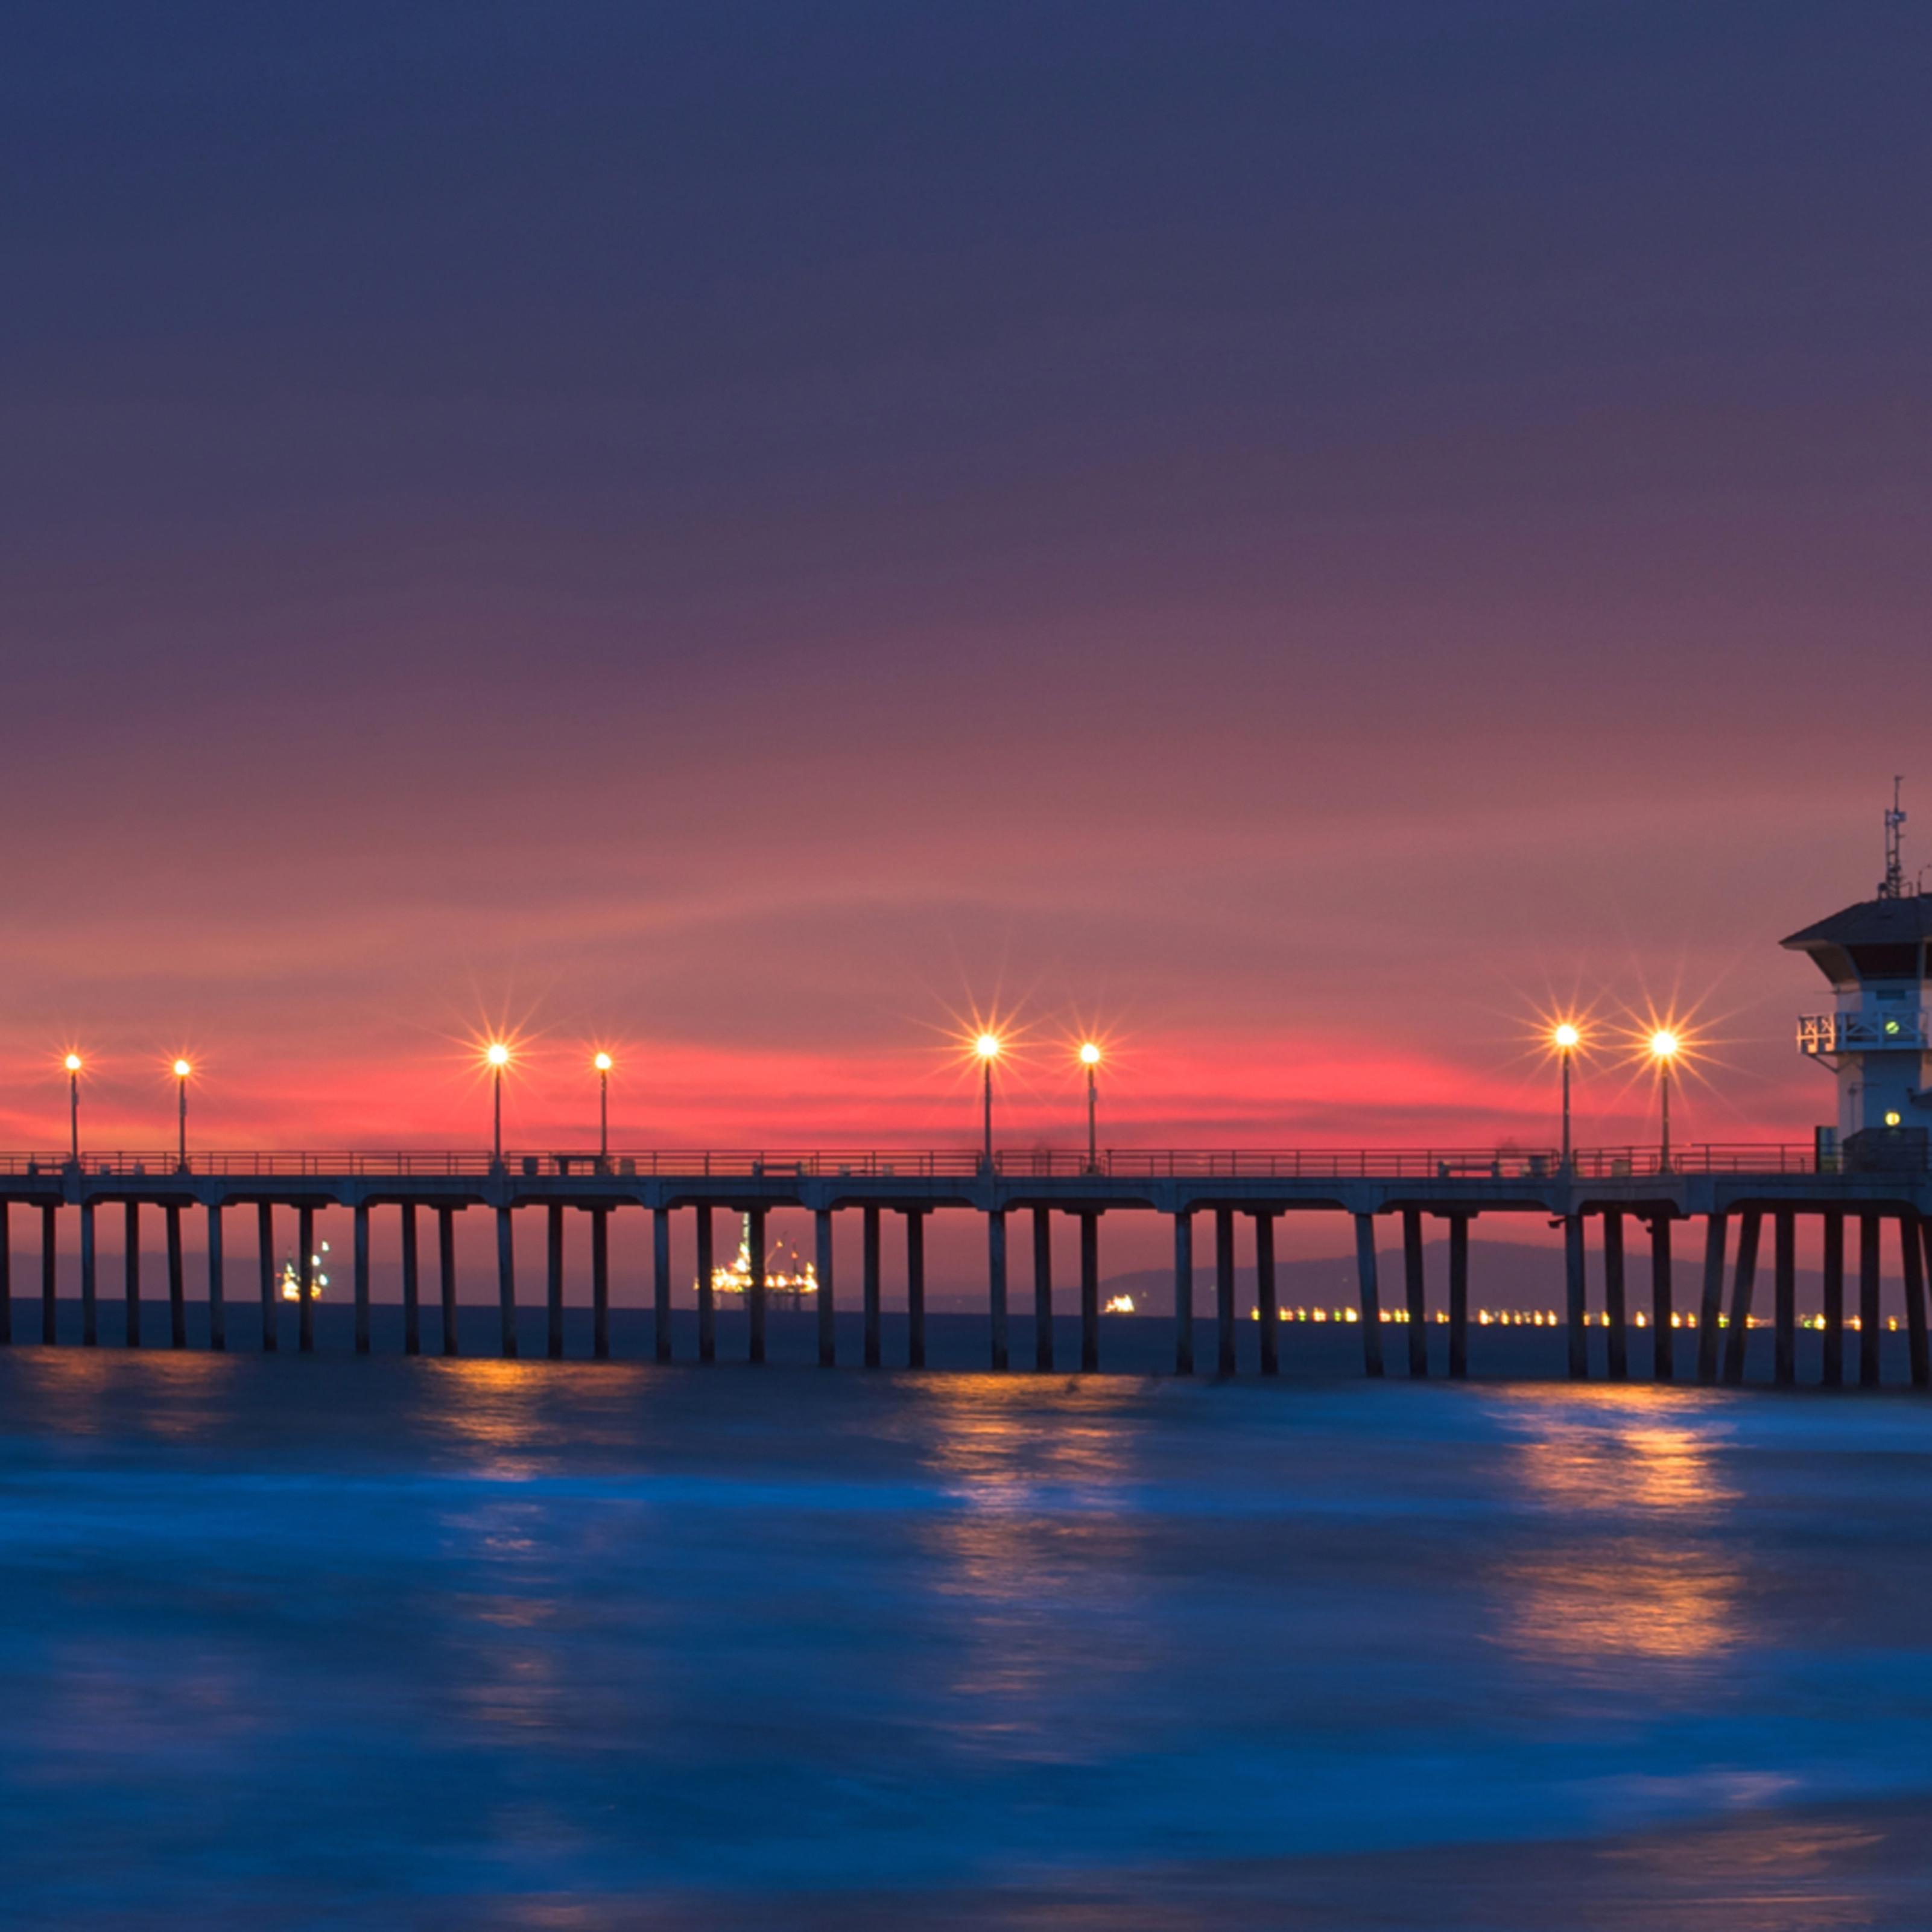 Huntington beach california sunset panorama nevcu8